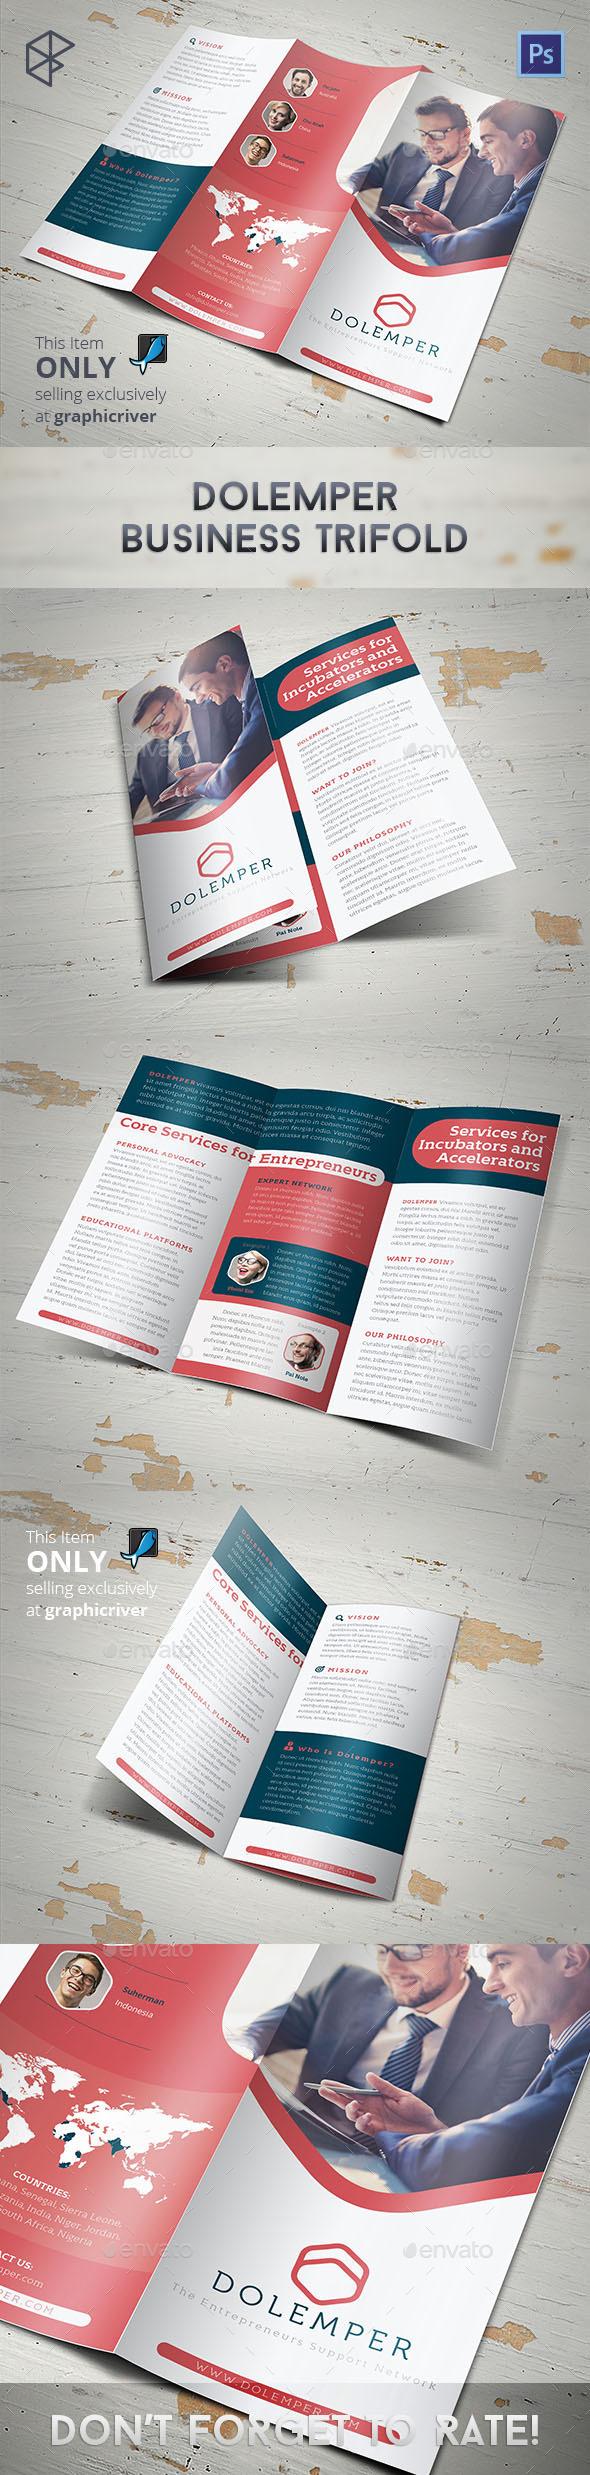 GraphicRiver Dolemper Business Trifold 10623496